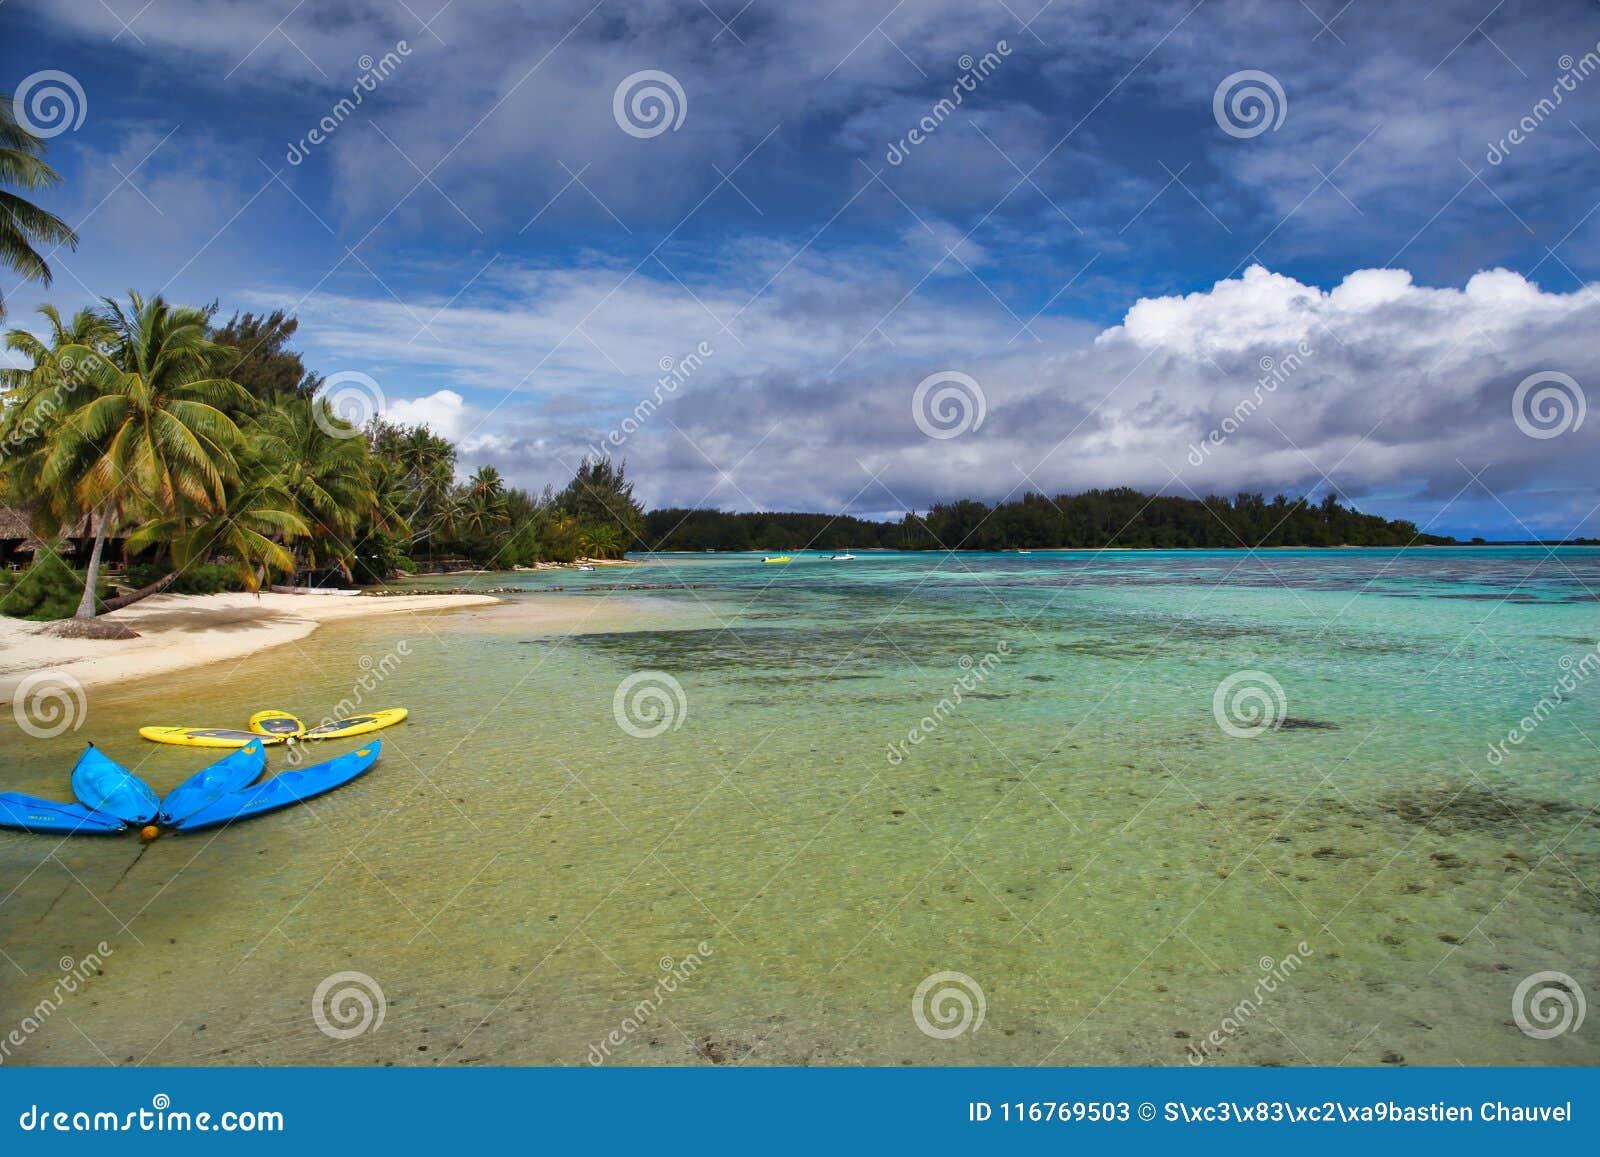 Moorea Island Tahiti French Polynesia Close To Bora Bora